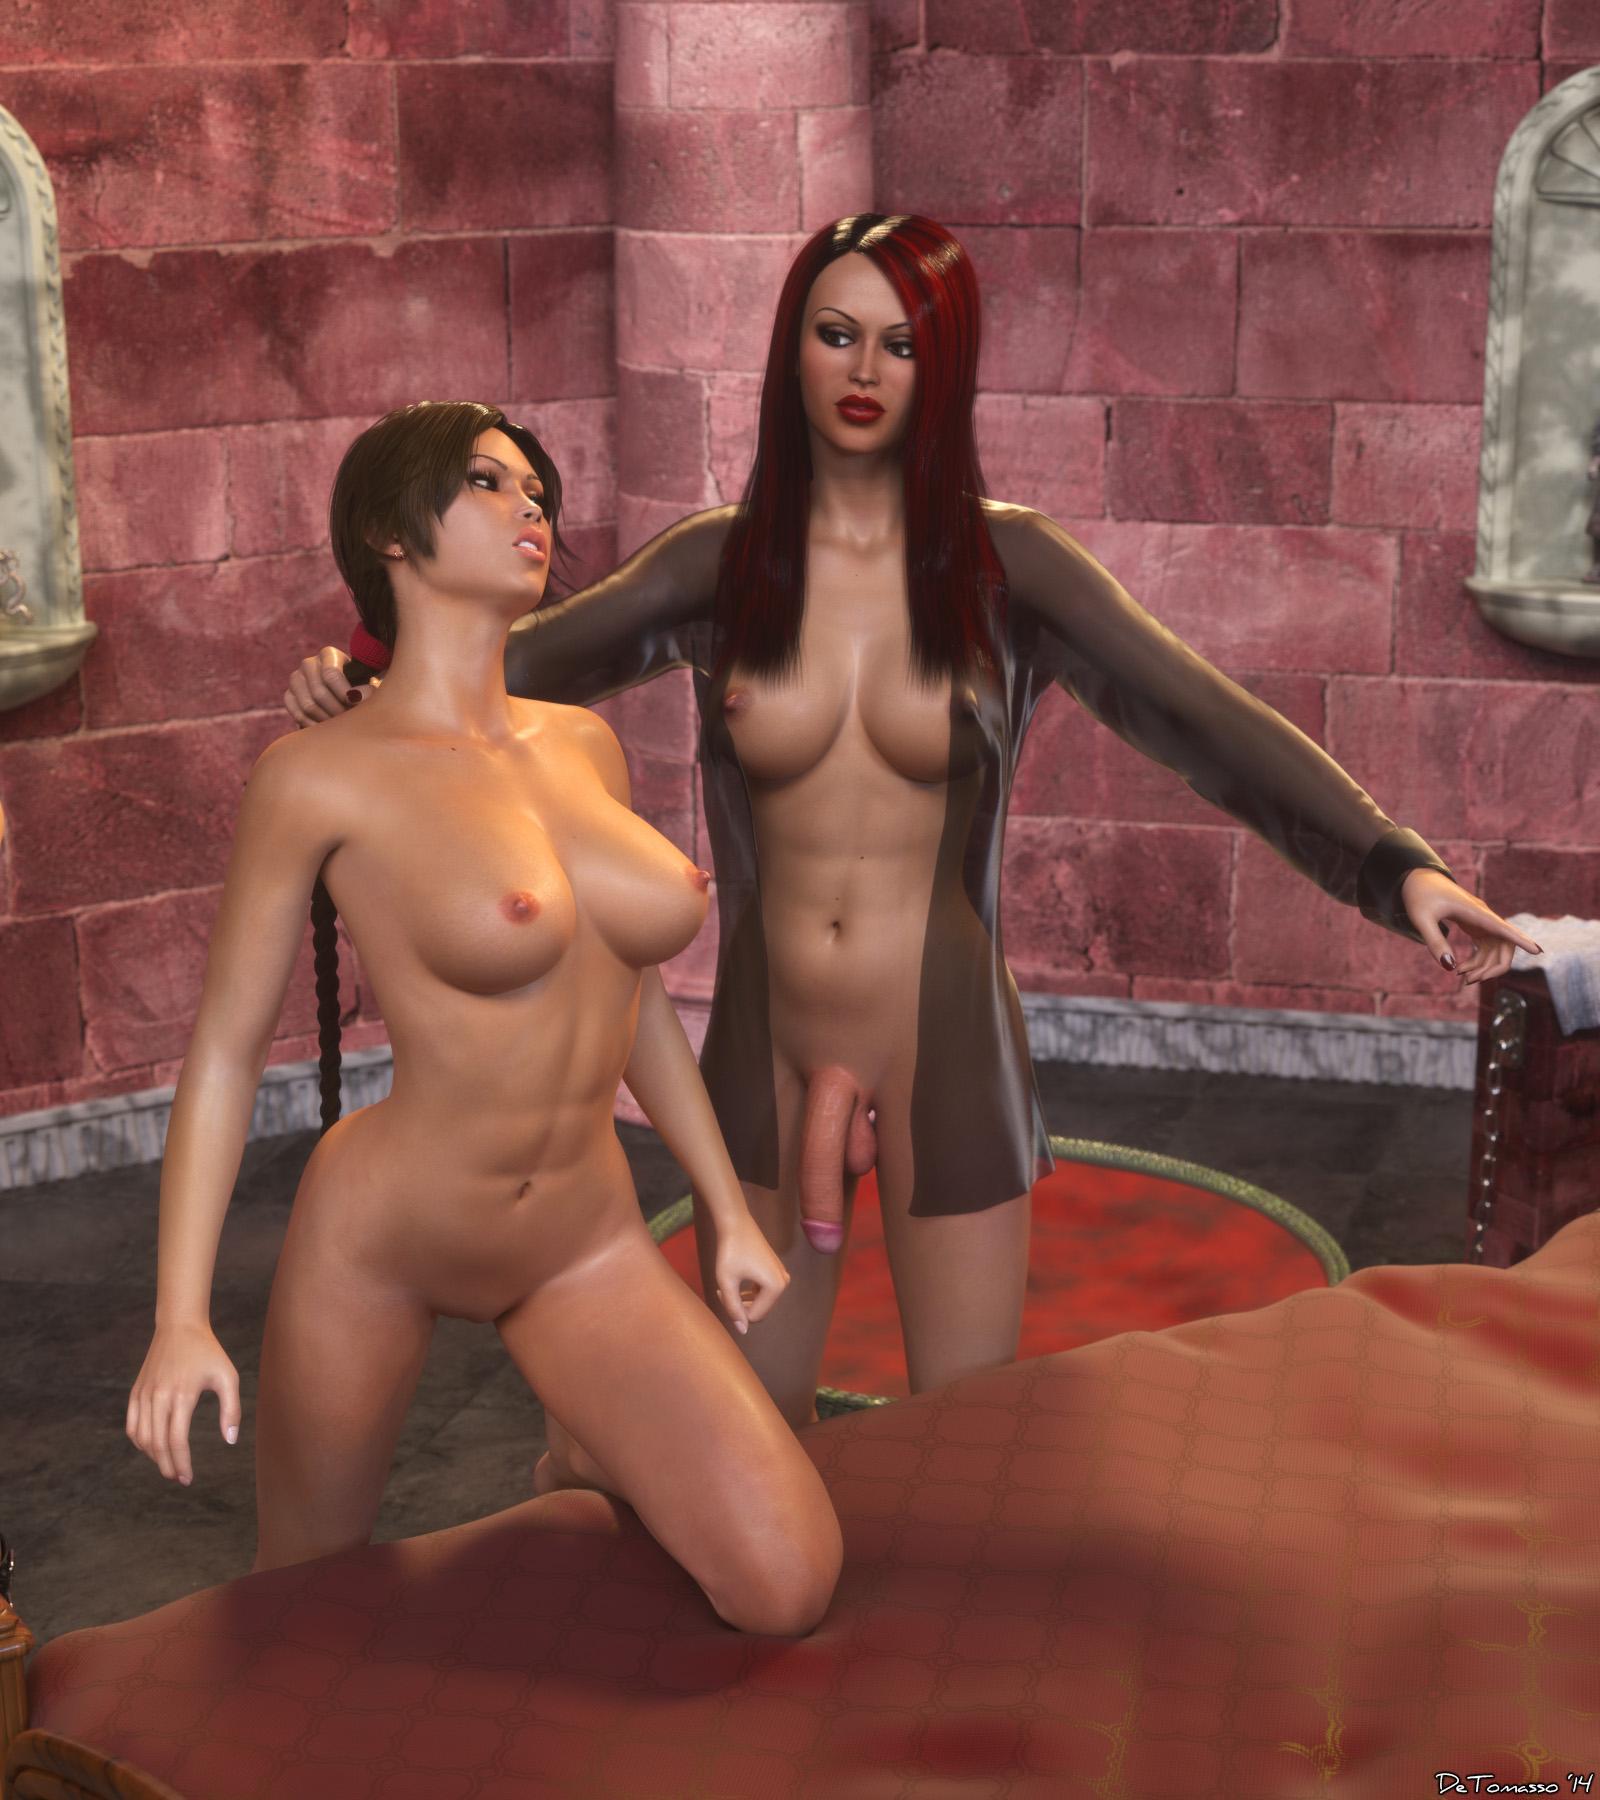 Lara croft solo sex gifs cartoon comic